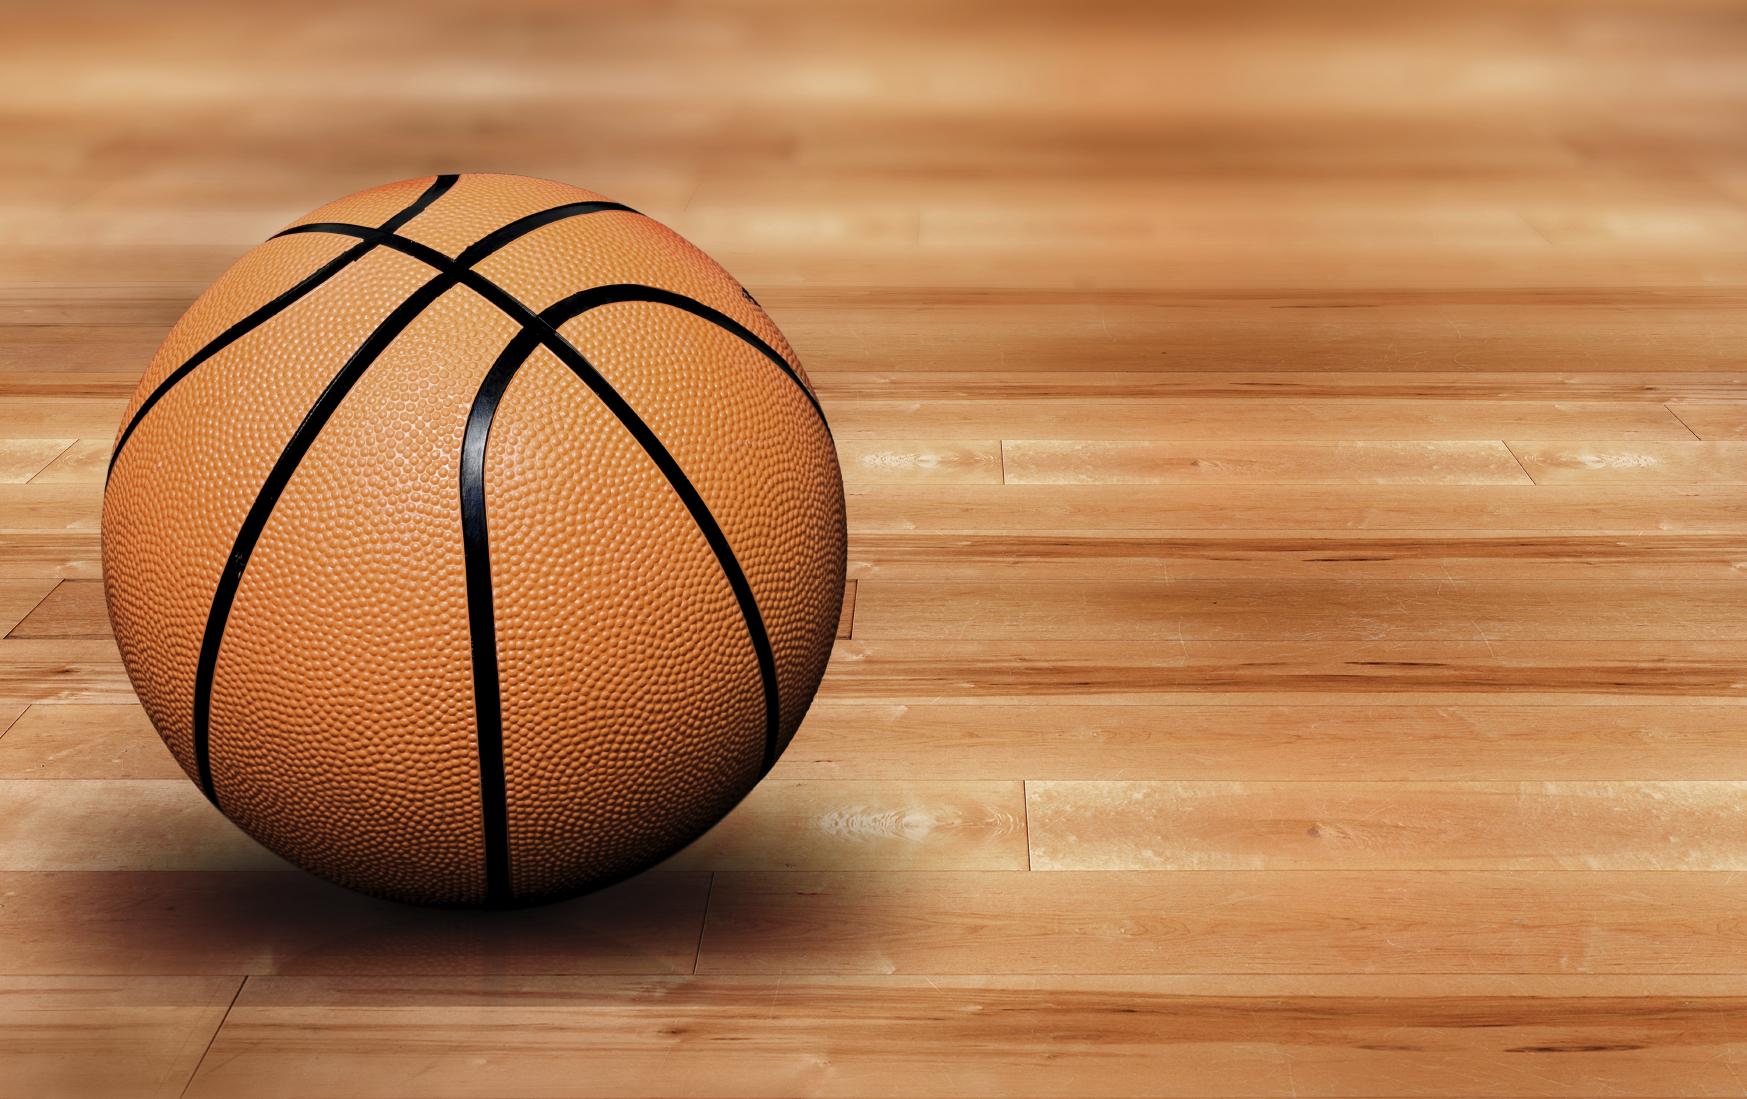 Pittsburgh: The NBA's next basketball City? | Pittsburgh ...